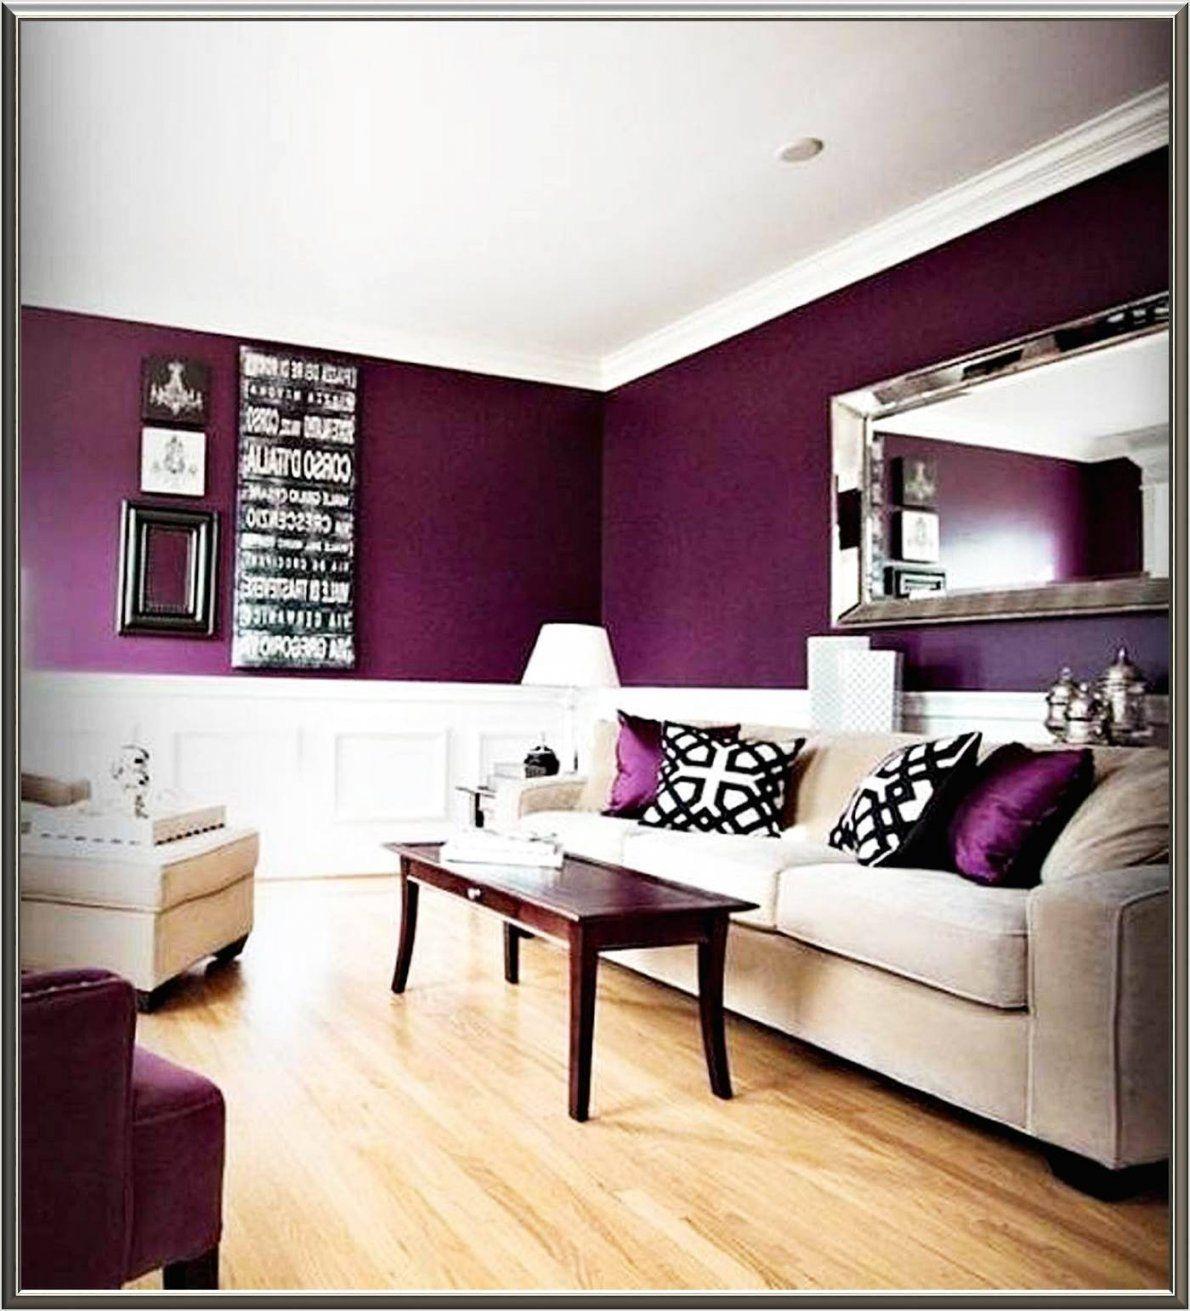 Streifen An Der Wand Genial 30 Tolle Wand Streichen Ideen Muster von Wand Streichen Streifen Ideen Photo